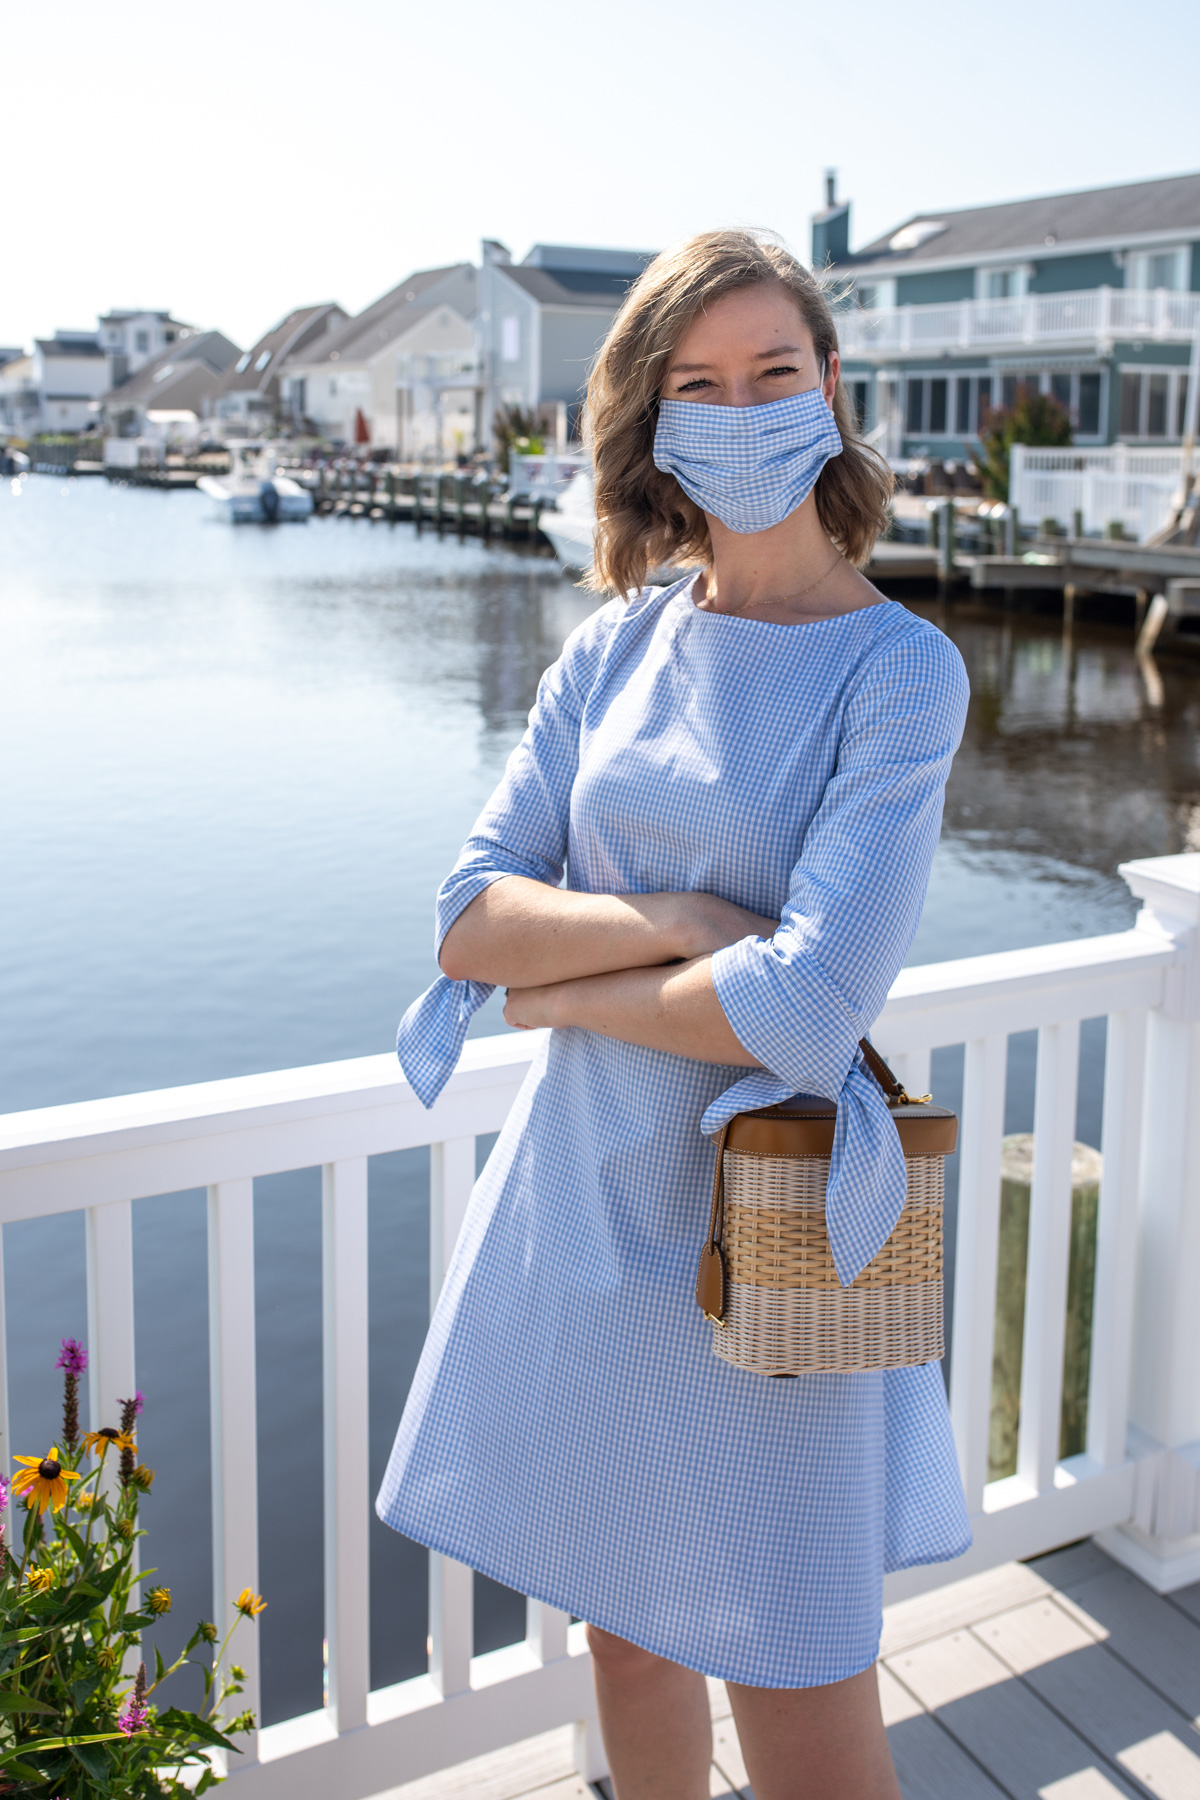 Stacie Flinner x Marta Scarampi Cotton Dress and Face mask-21.jpg